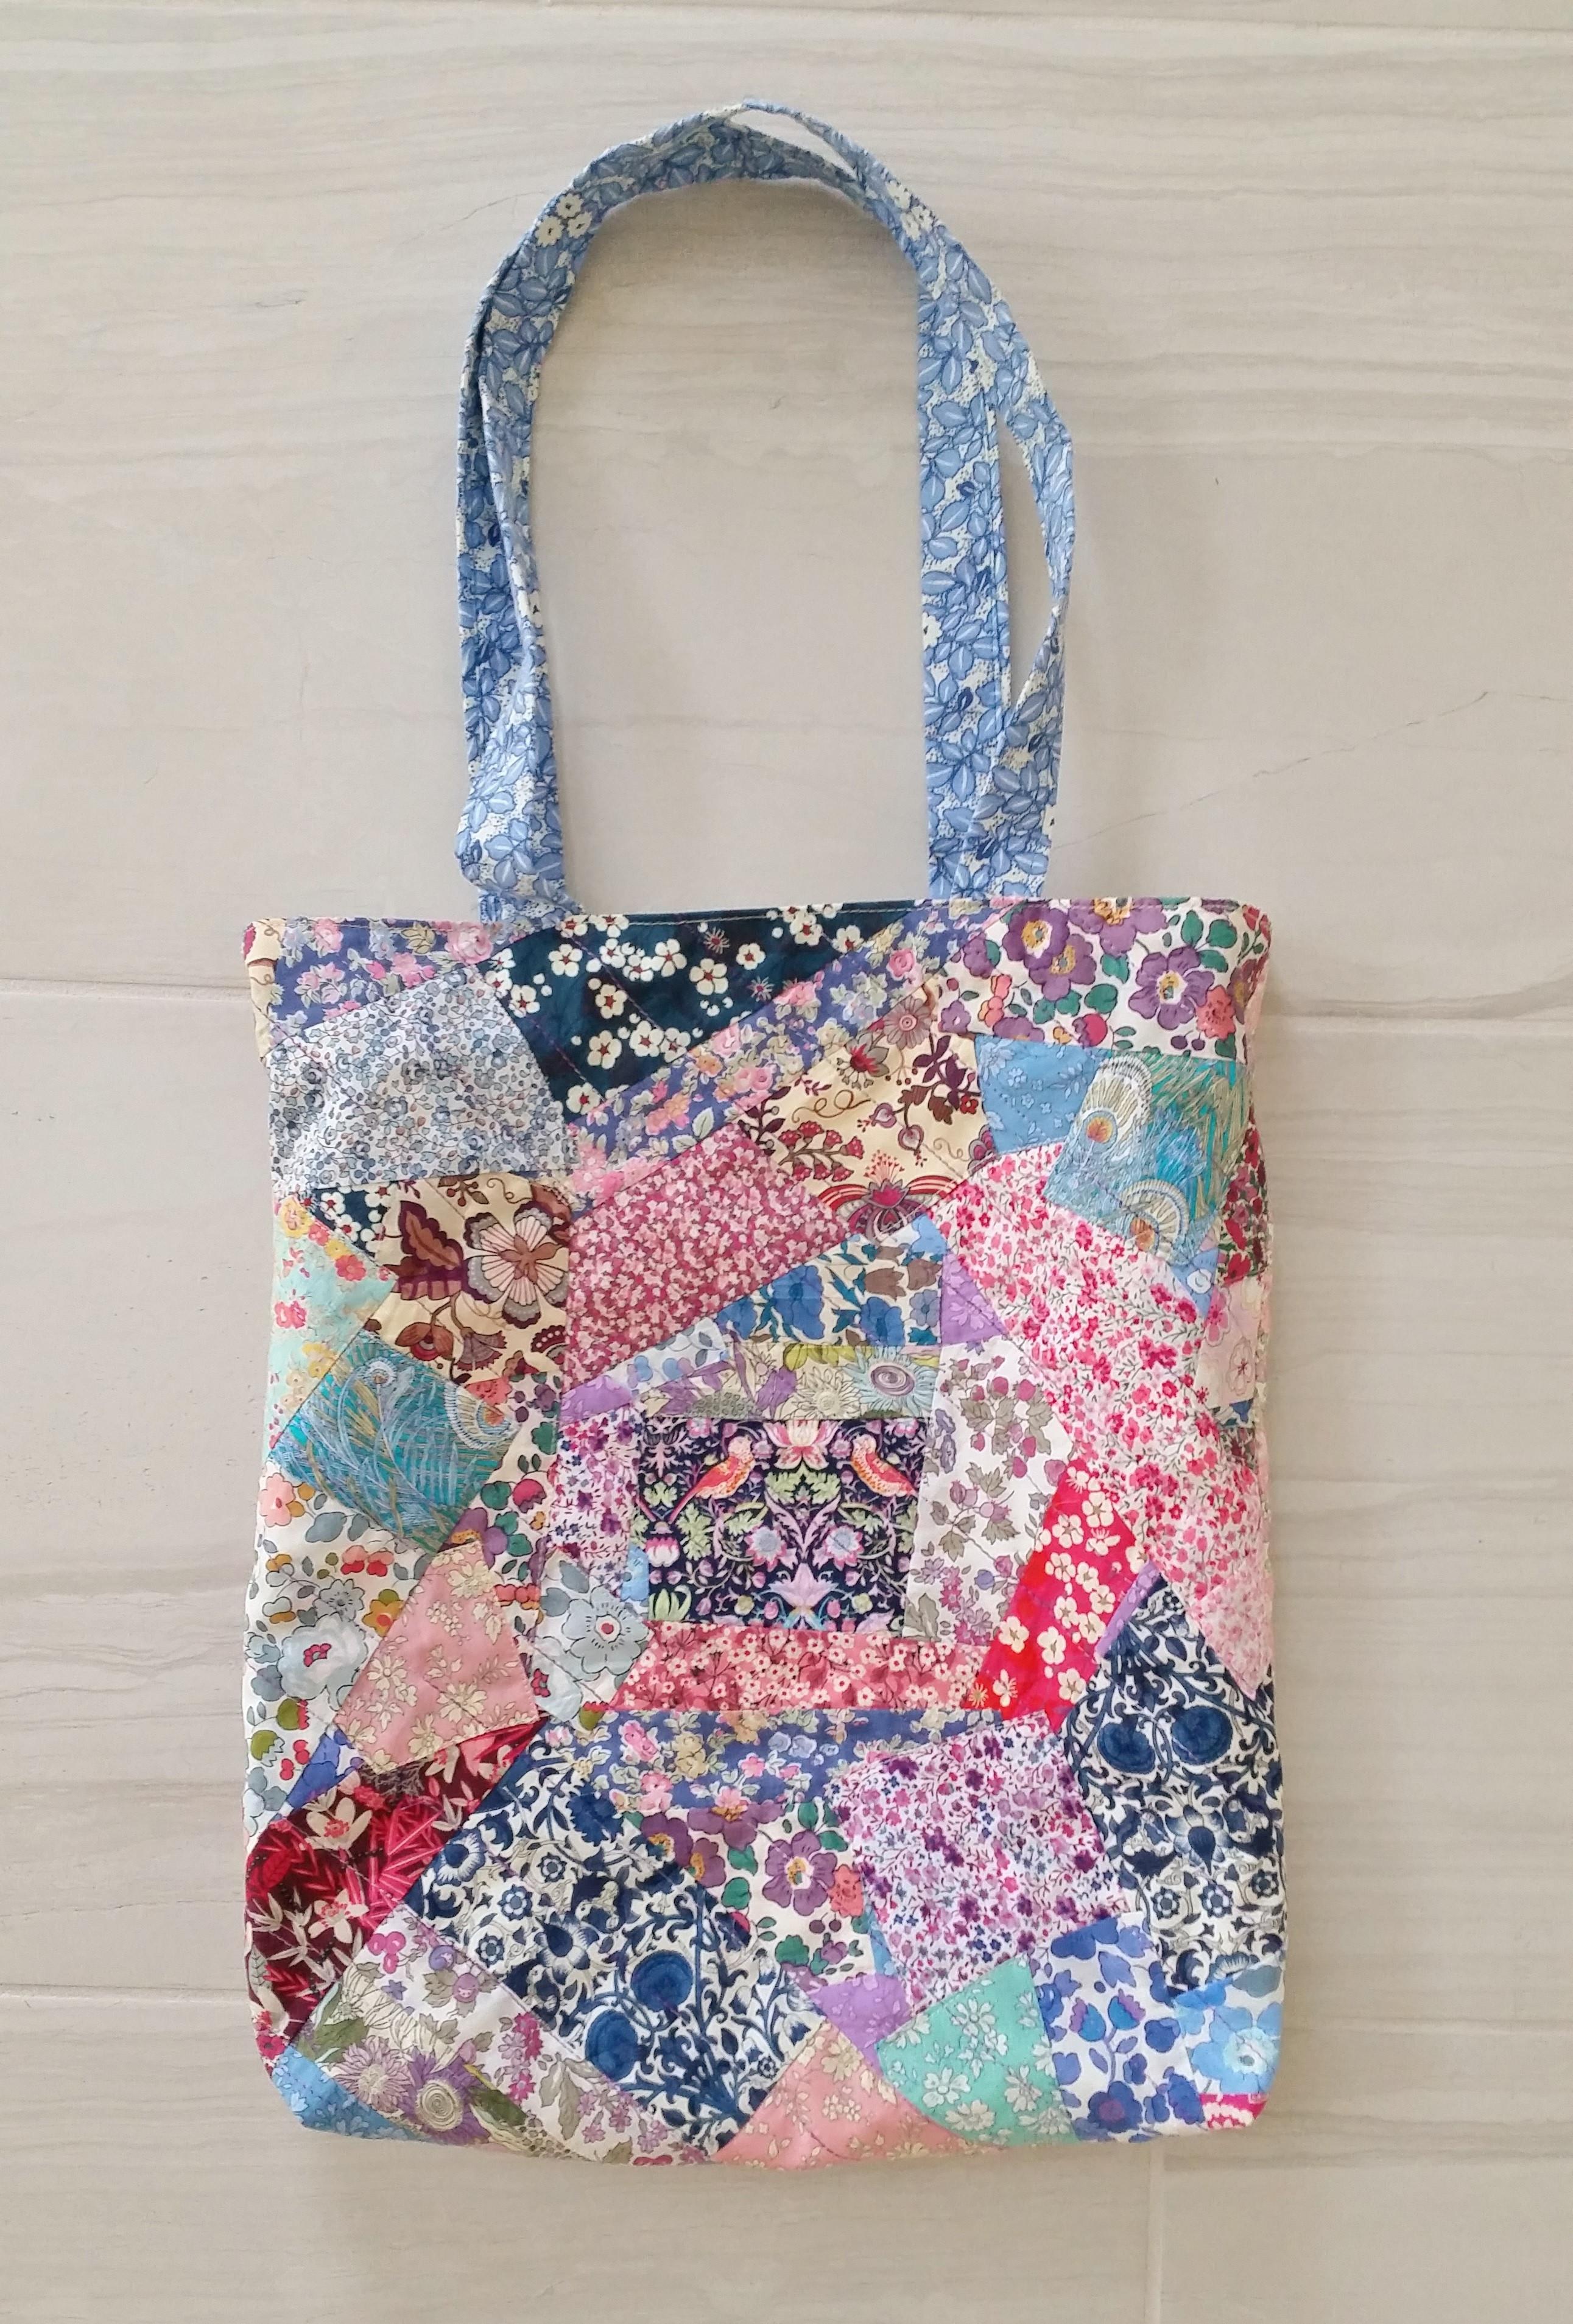 Handbad Diy  DIY Liberty London Patchwork Tote Bag